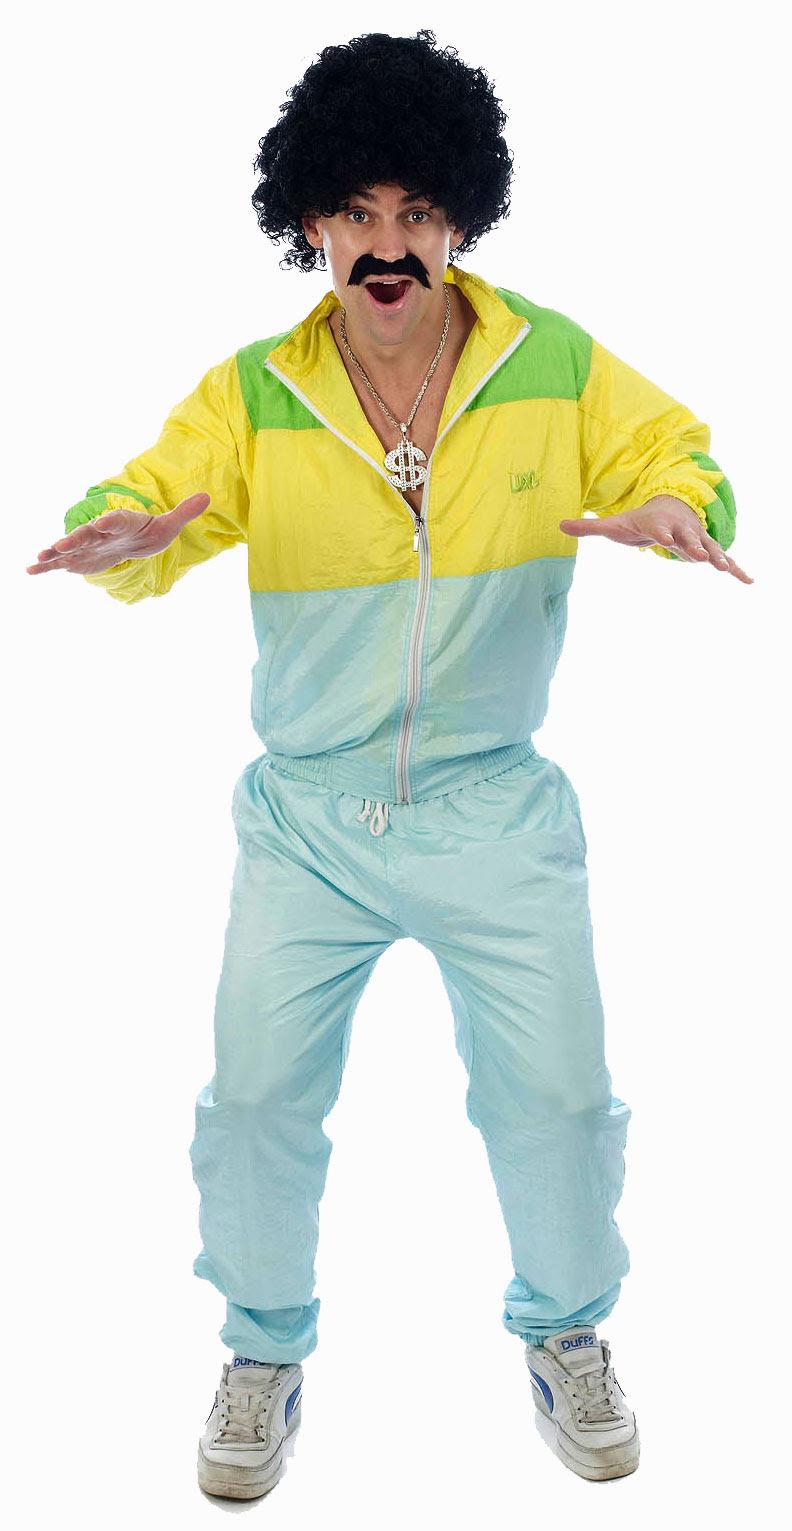 shell suit 80s scouser fancy dress tracksuit mens costume